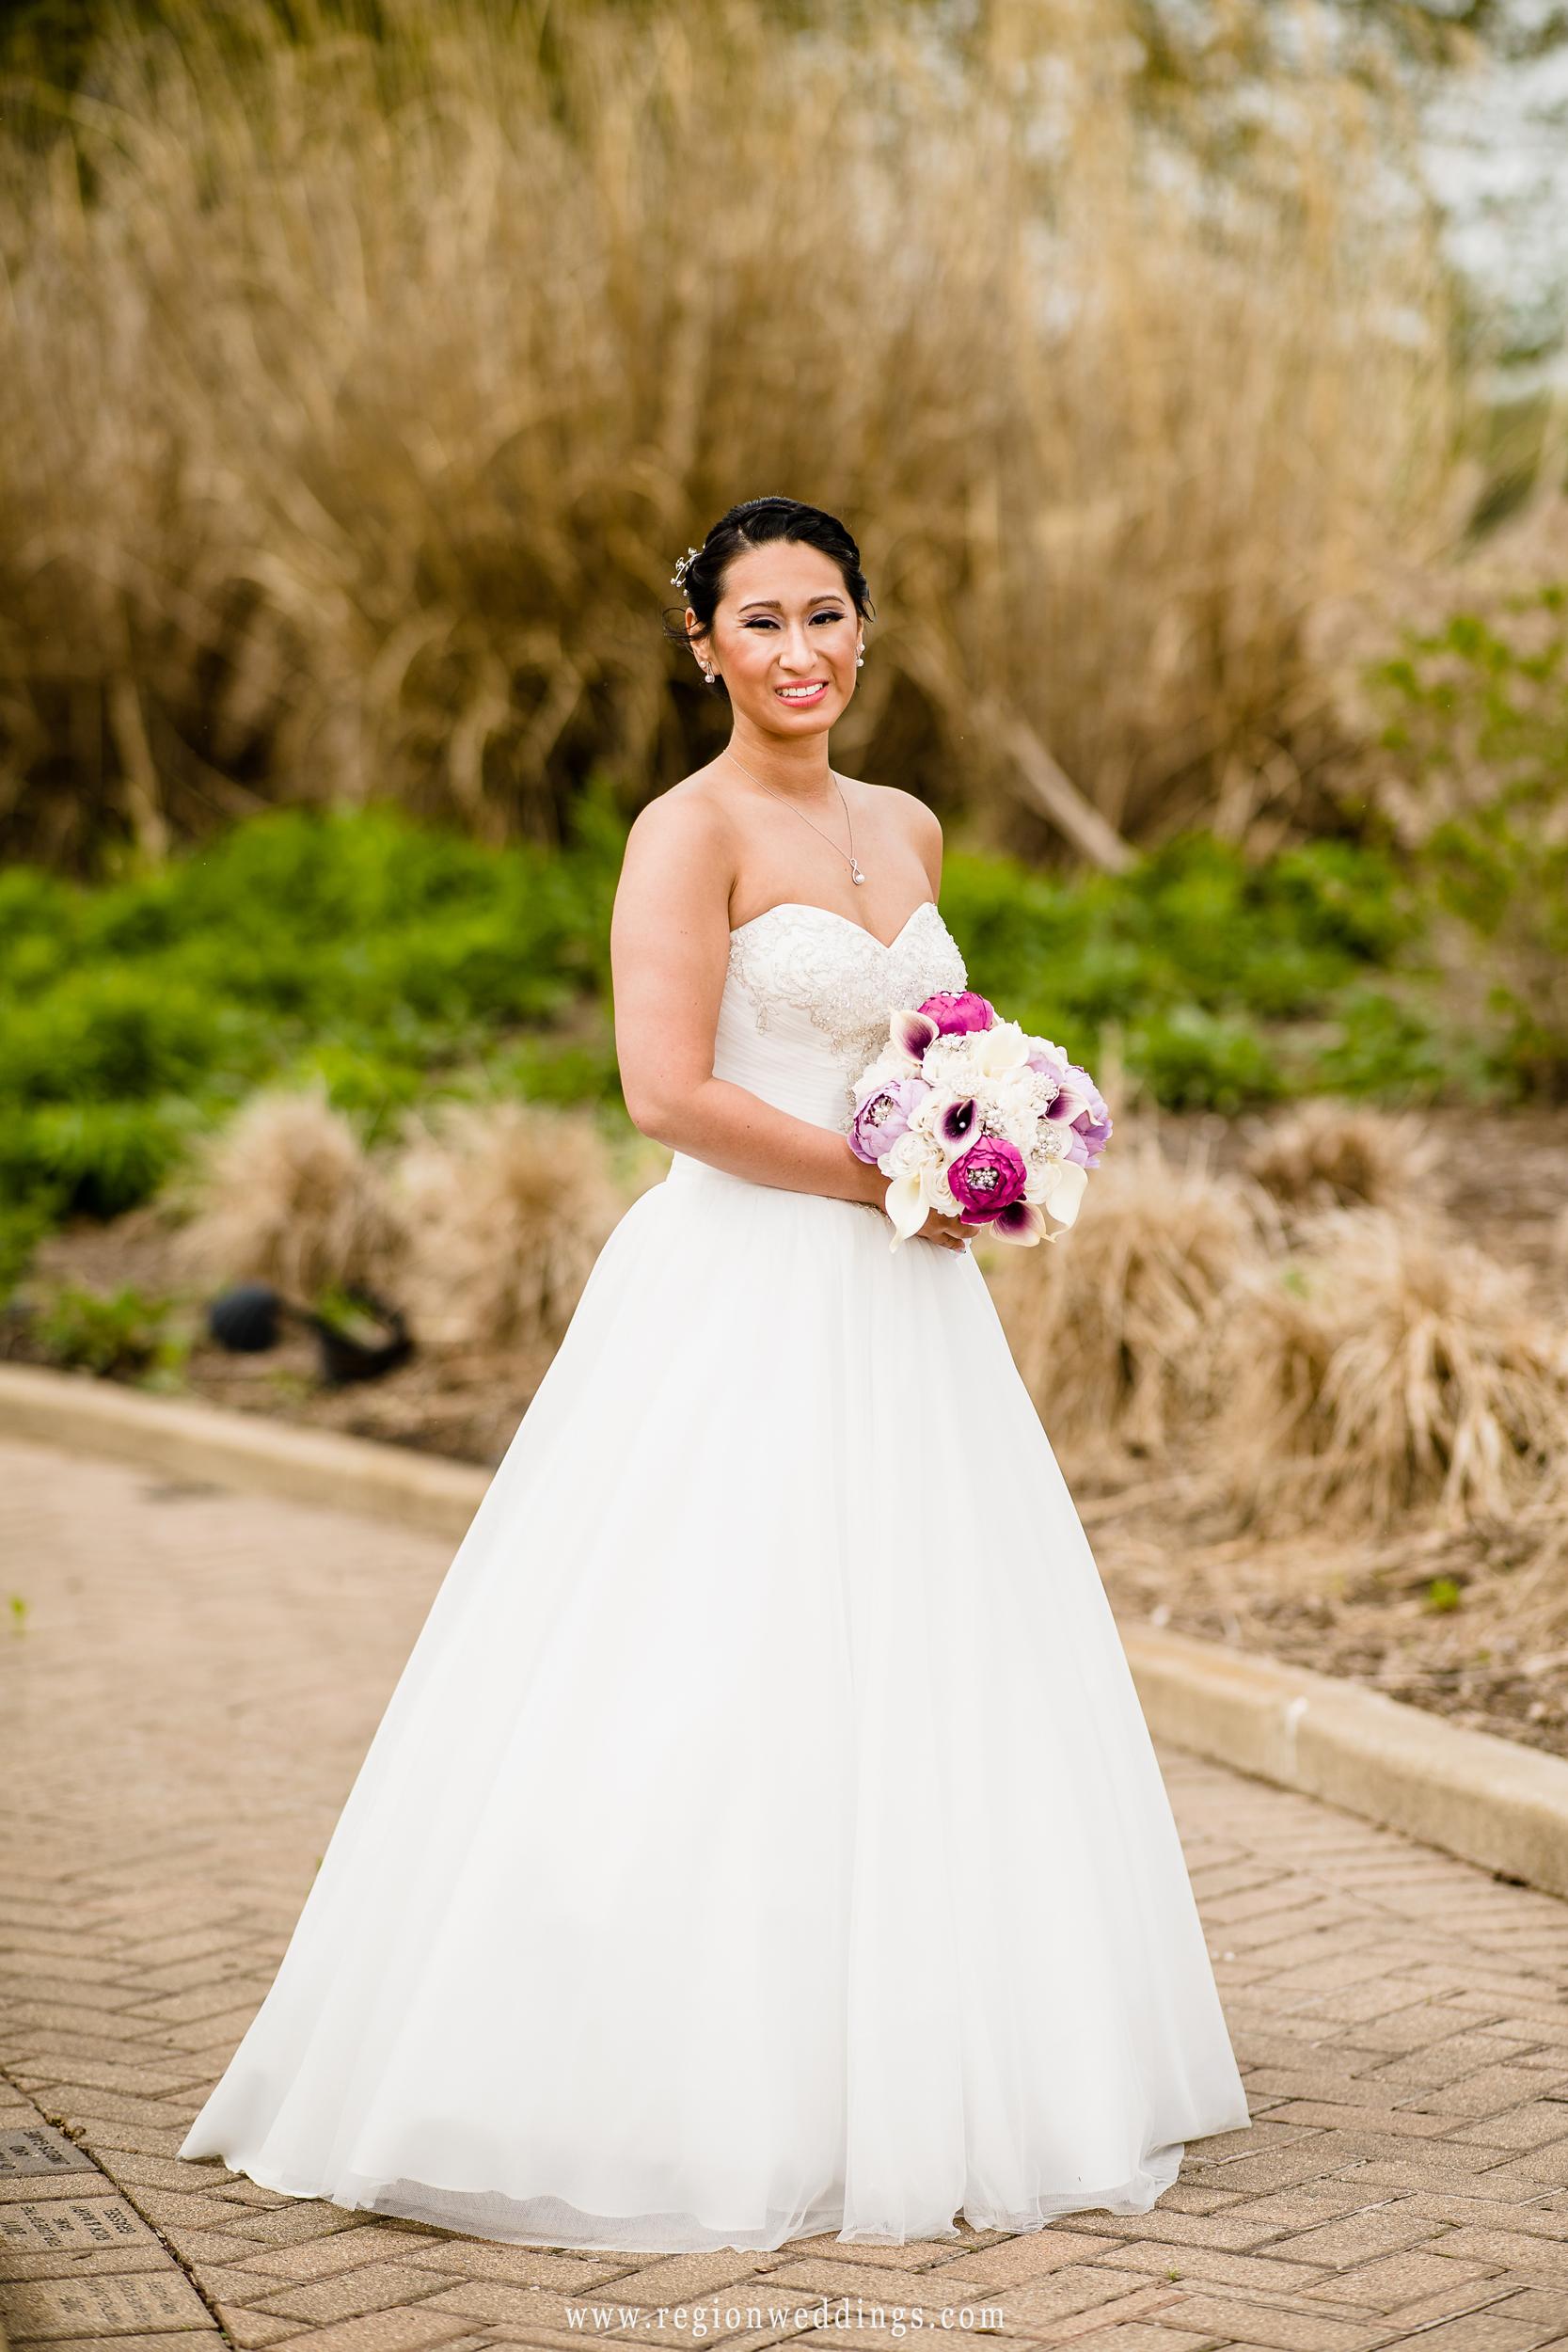 Portrait of the bride in the Sand Creek garden.